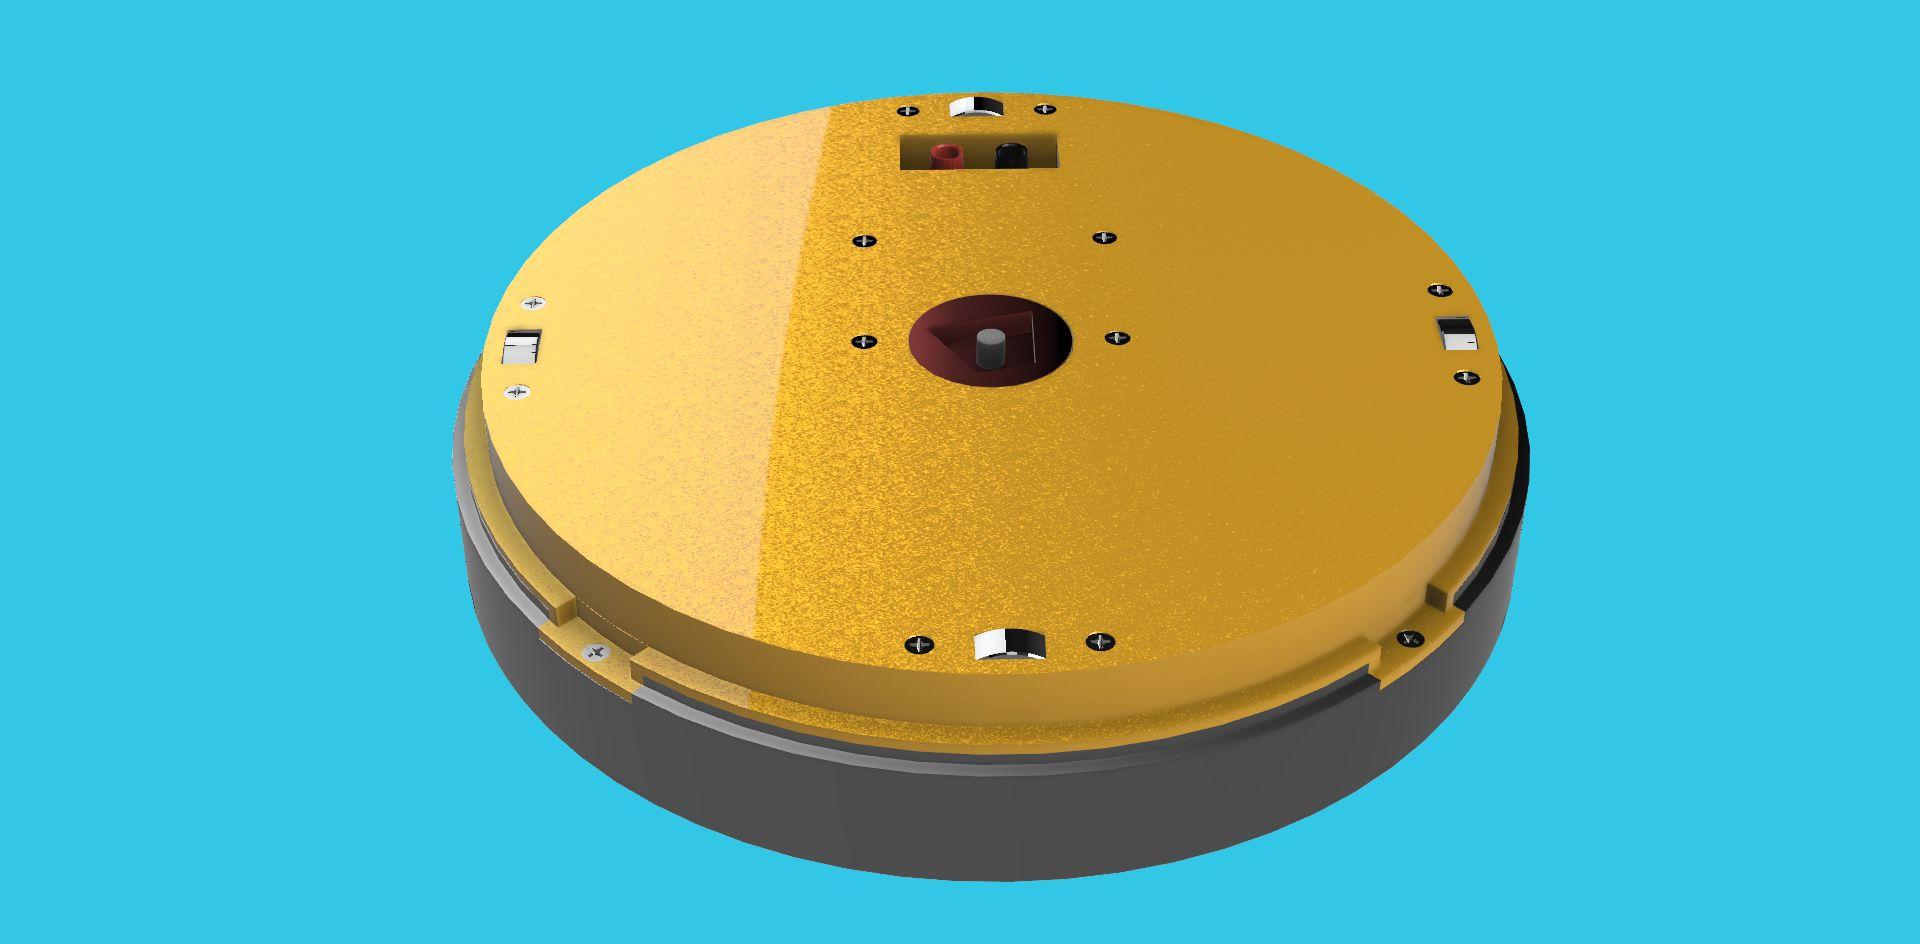 Robocombo-mod4-v7-3-3500-3500